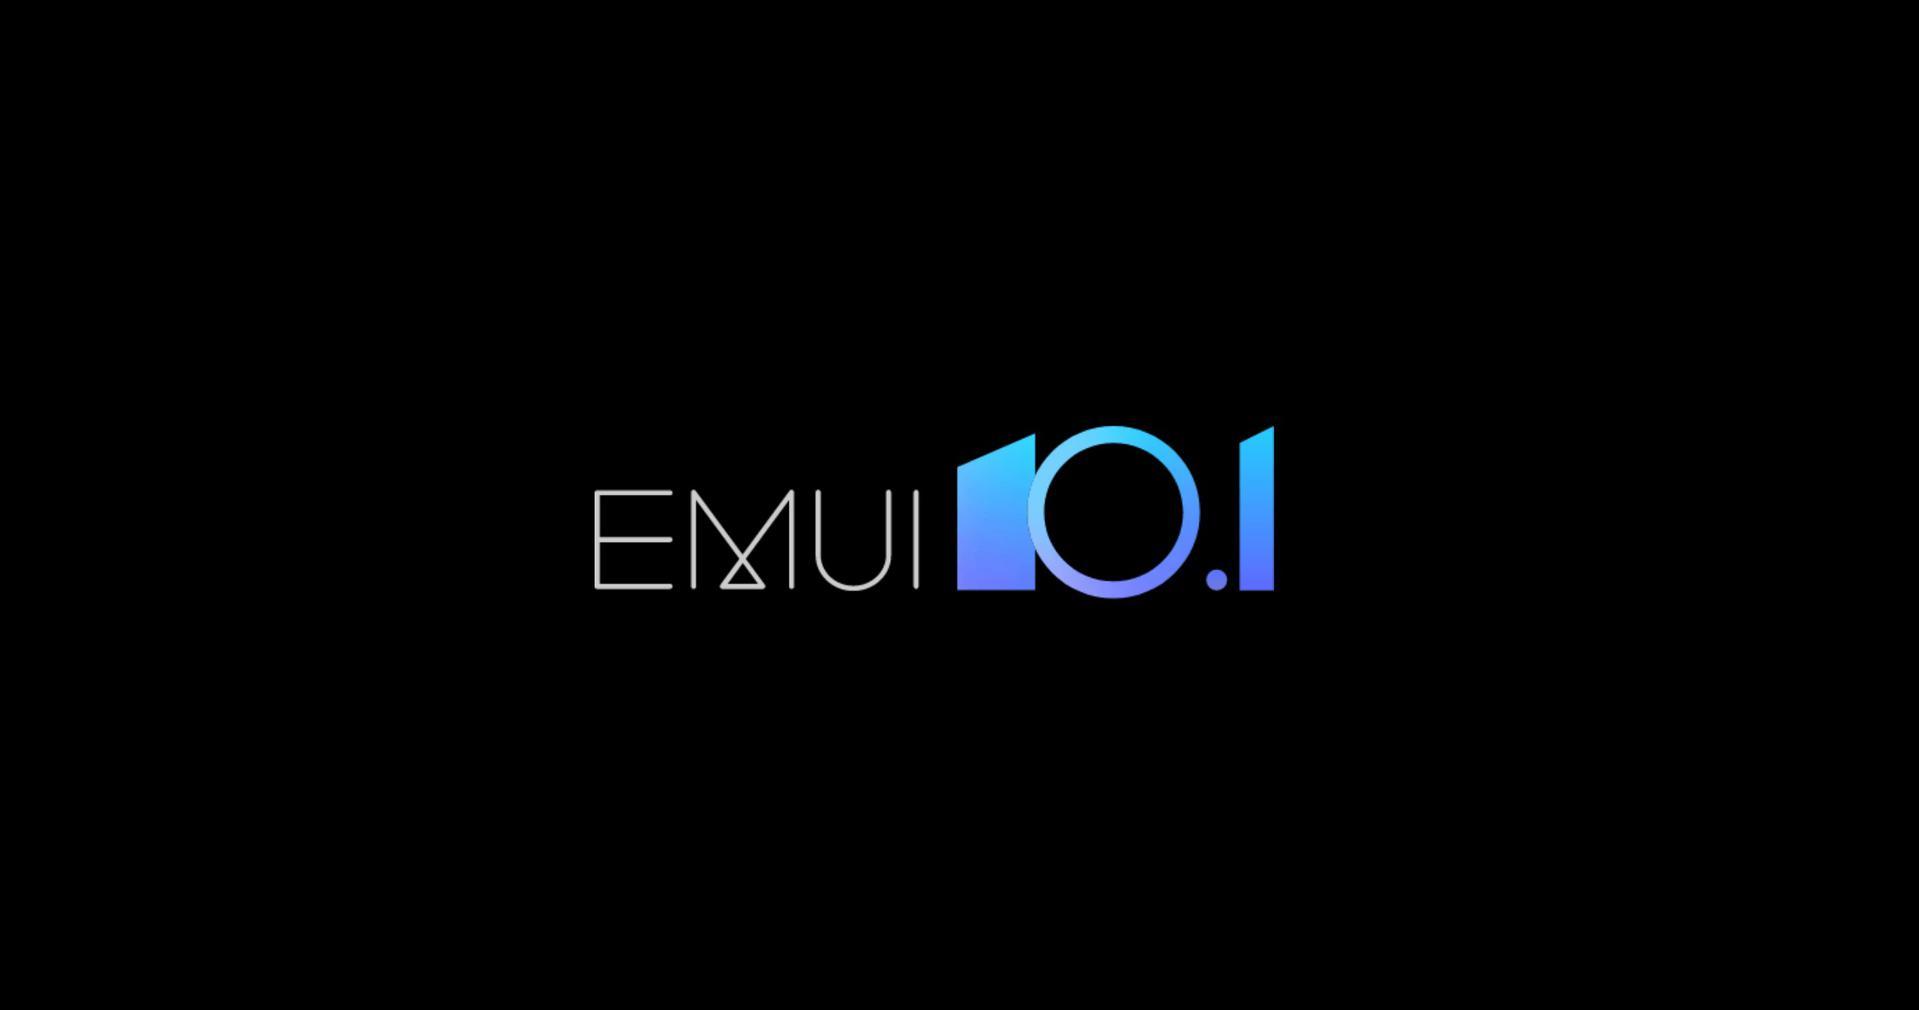 Huawei P30, Huawei Mate 30 и Huawei Nova 5T получили бета-версию EMUI 10.1 на глобальном рынке